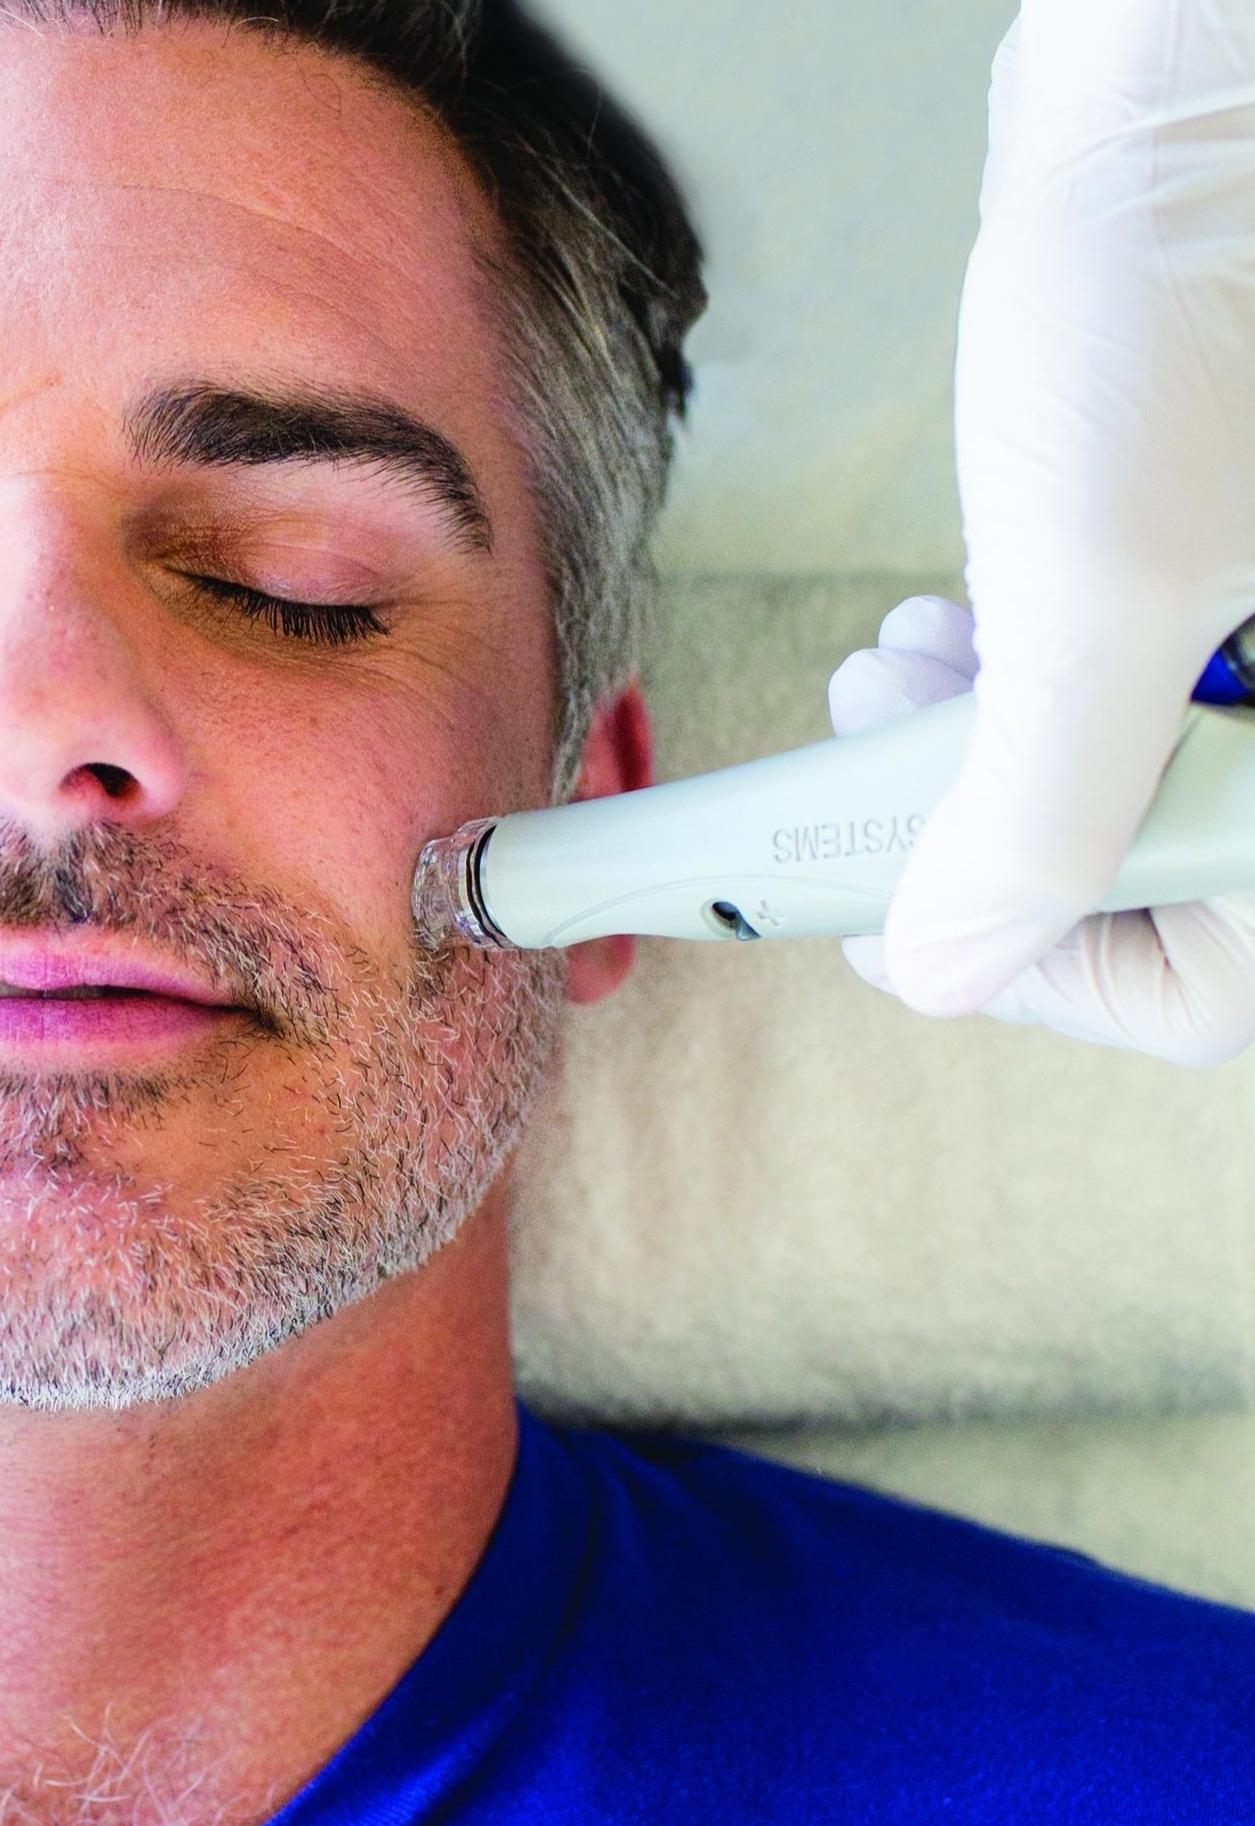 HF_Treatment_Photo-0022.jpg